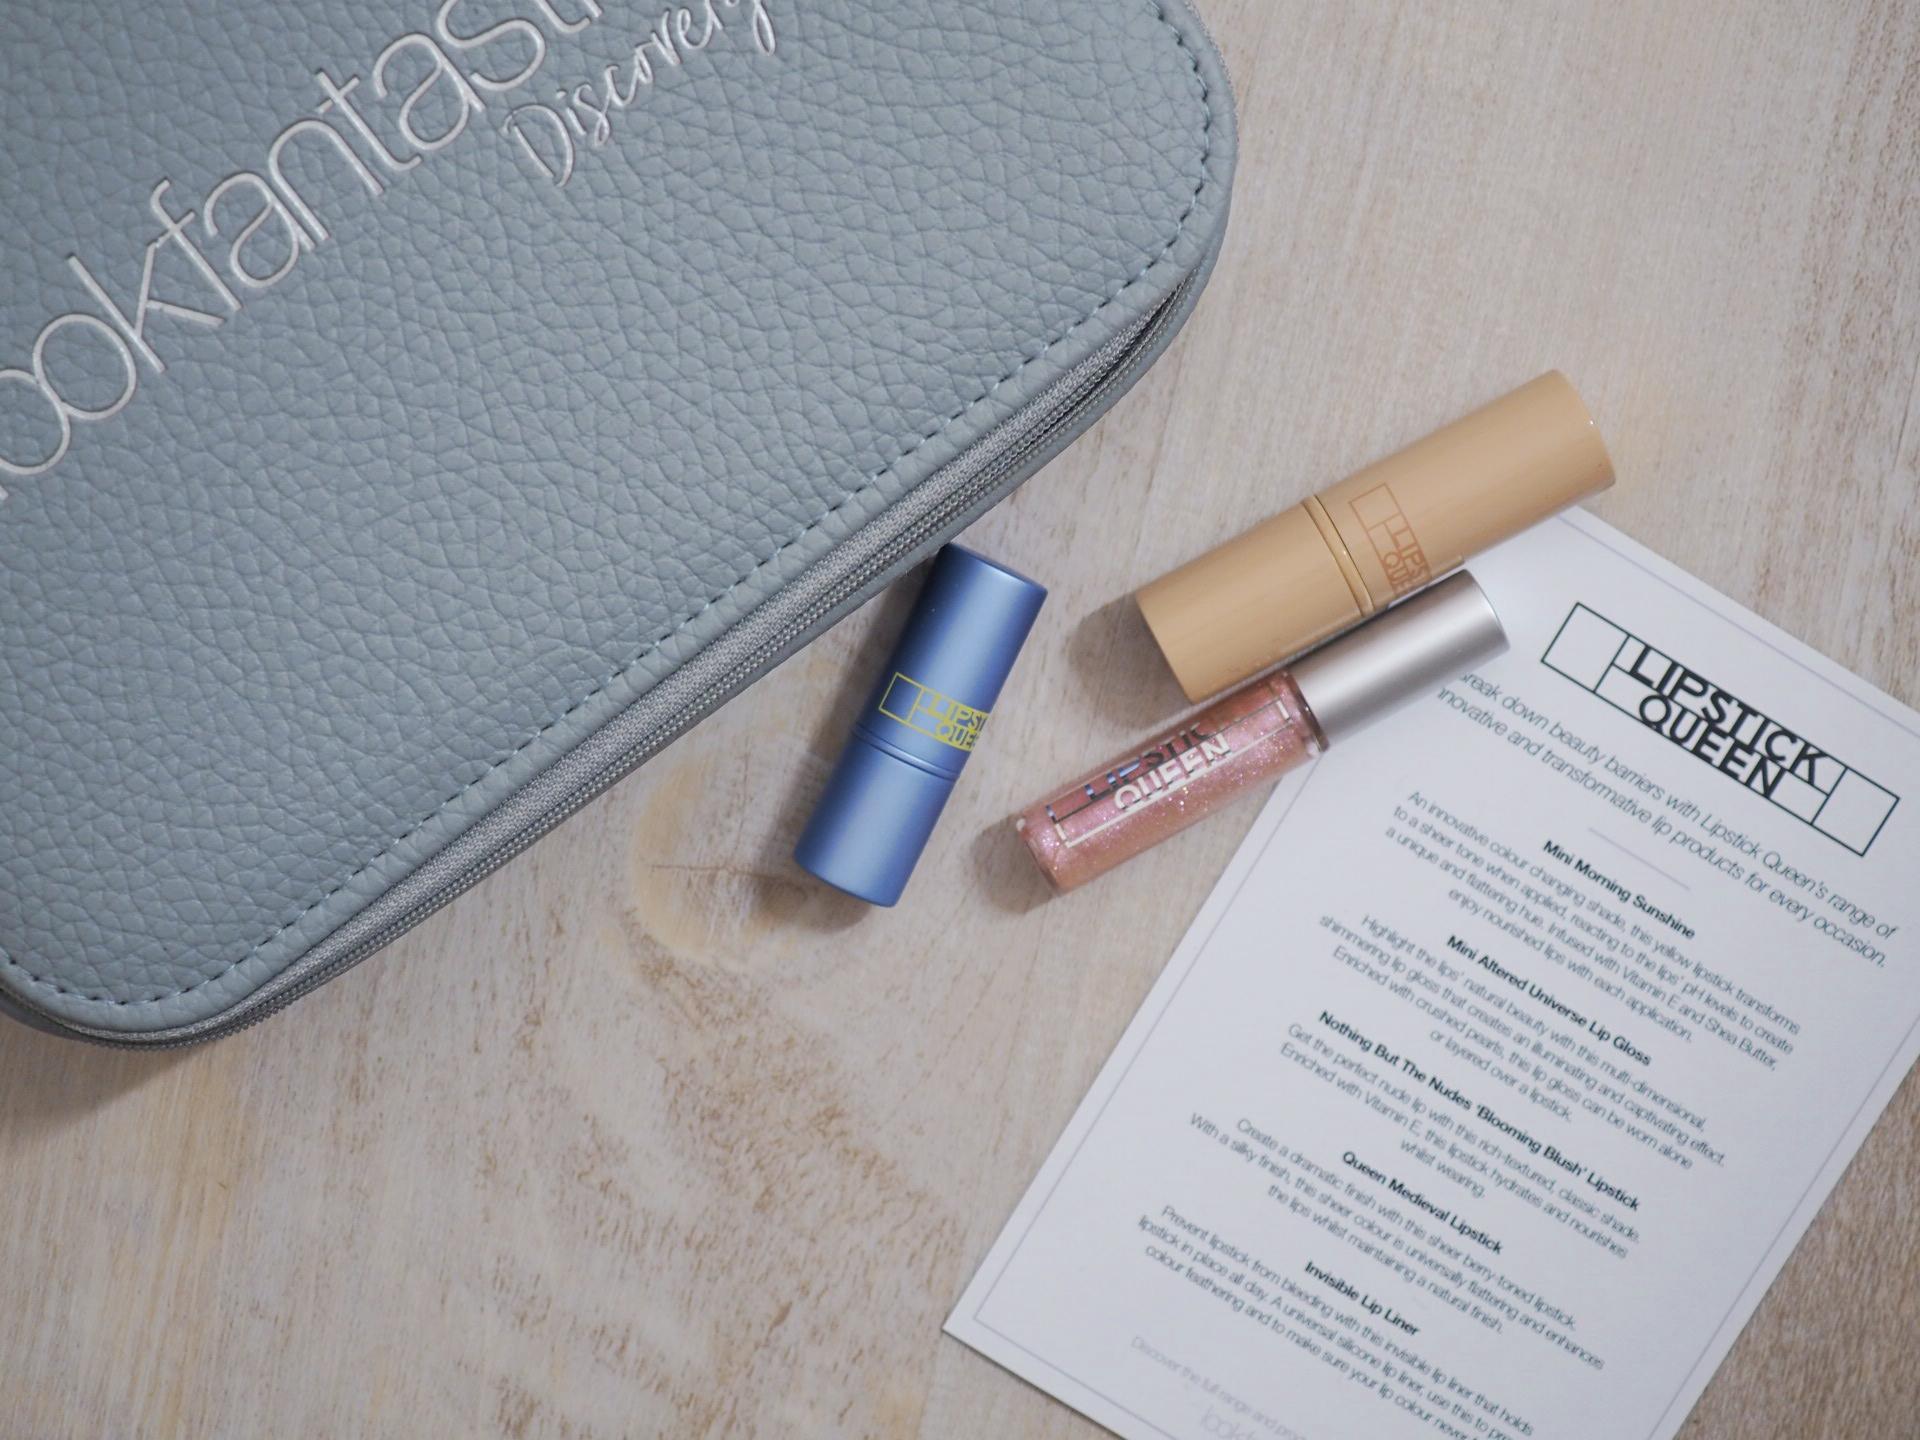 LF Discover Bag - Lipstick Queen